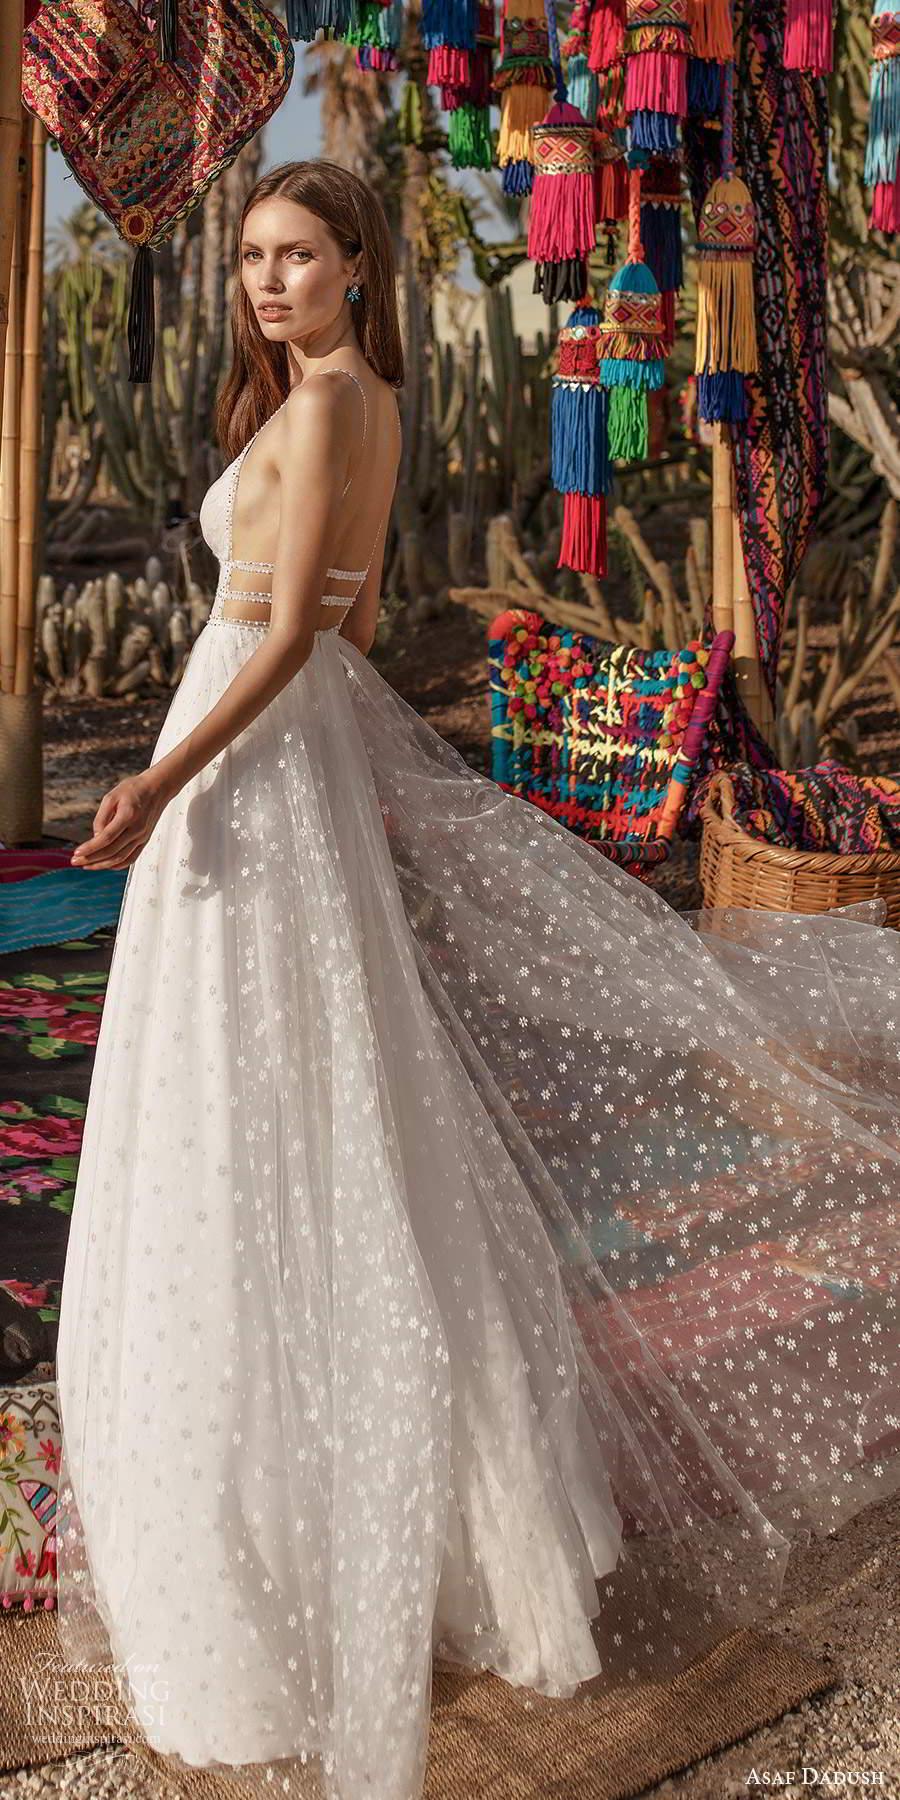 asaf dadush 2020 bridal sleeveless thin beaded straps plunging v neckline fully embellished a line ball gown wedding dress slit skirt open back (7) bv